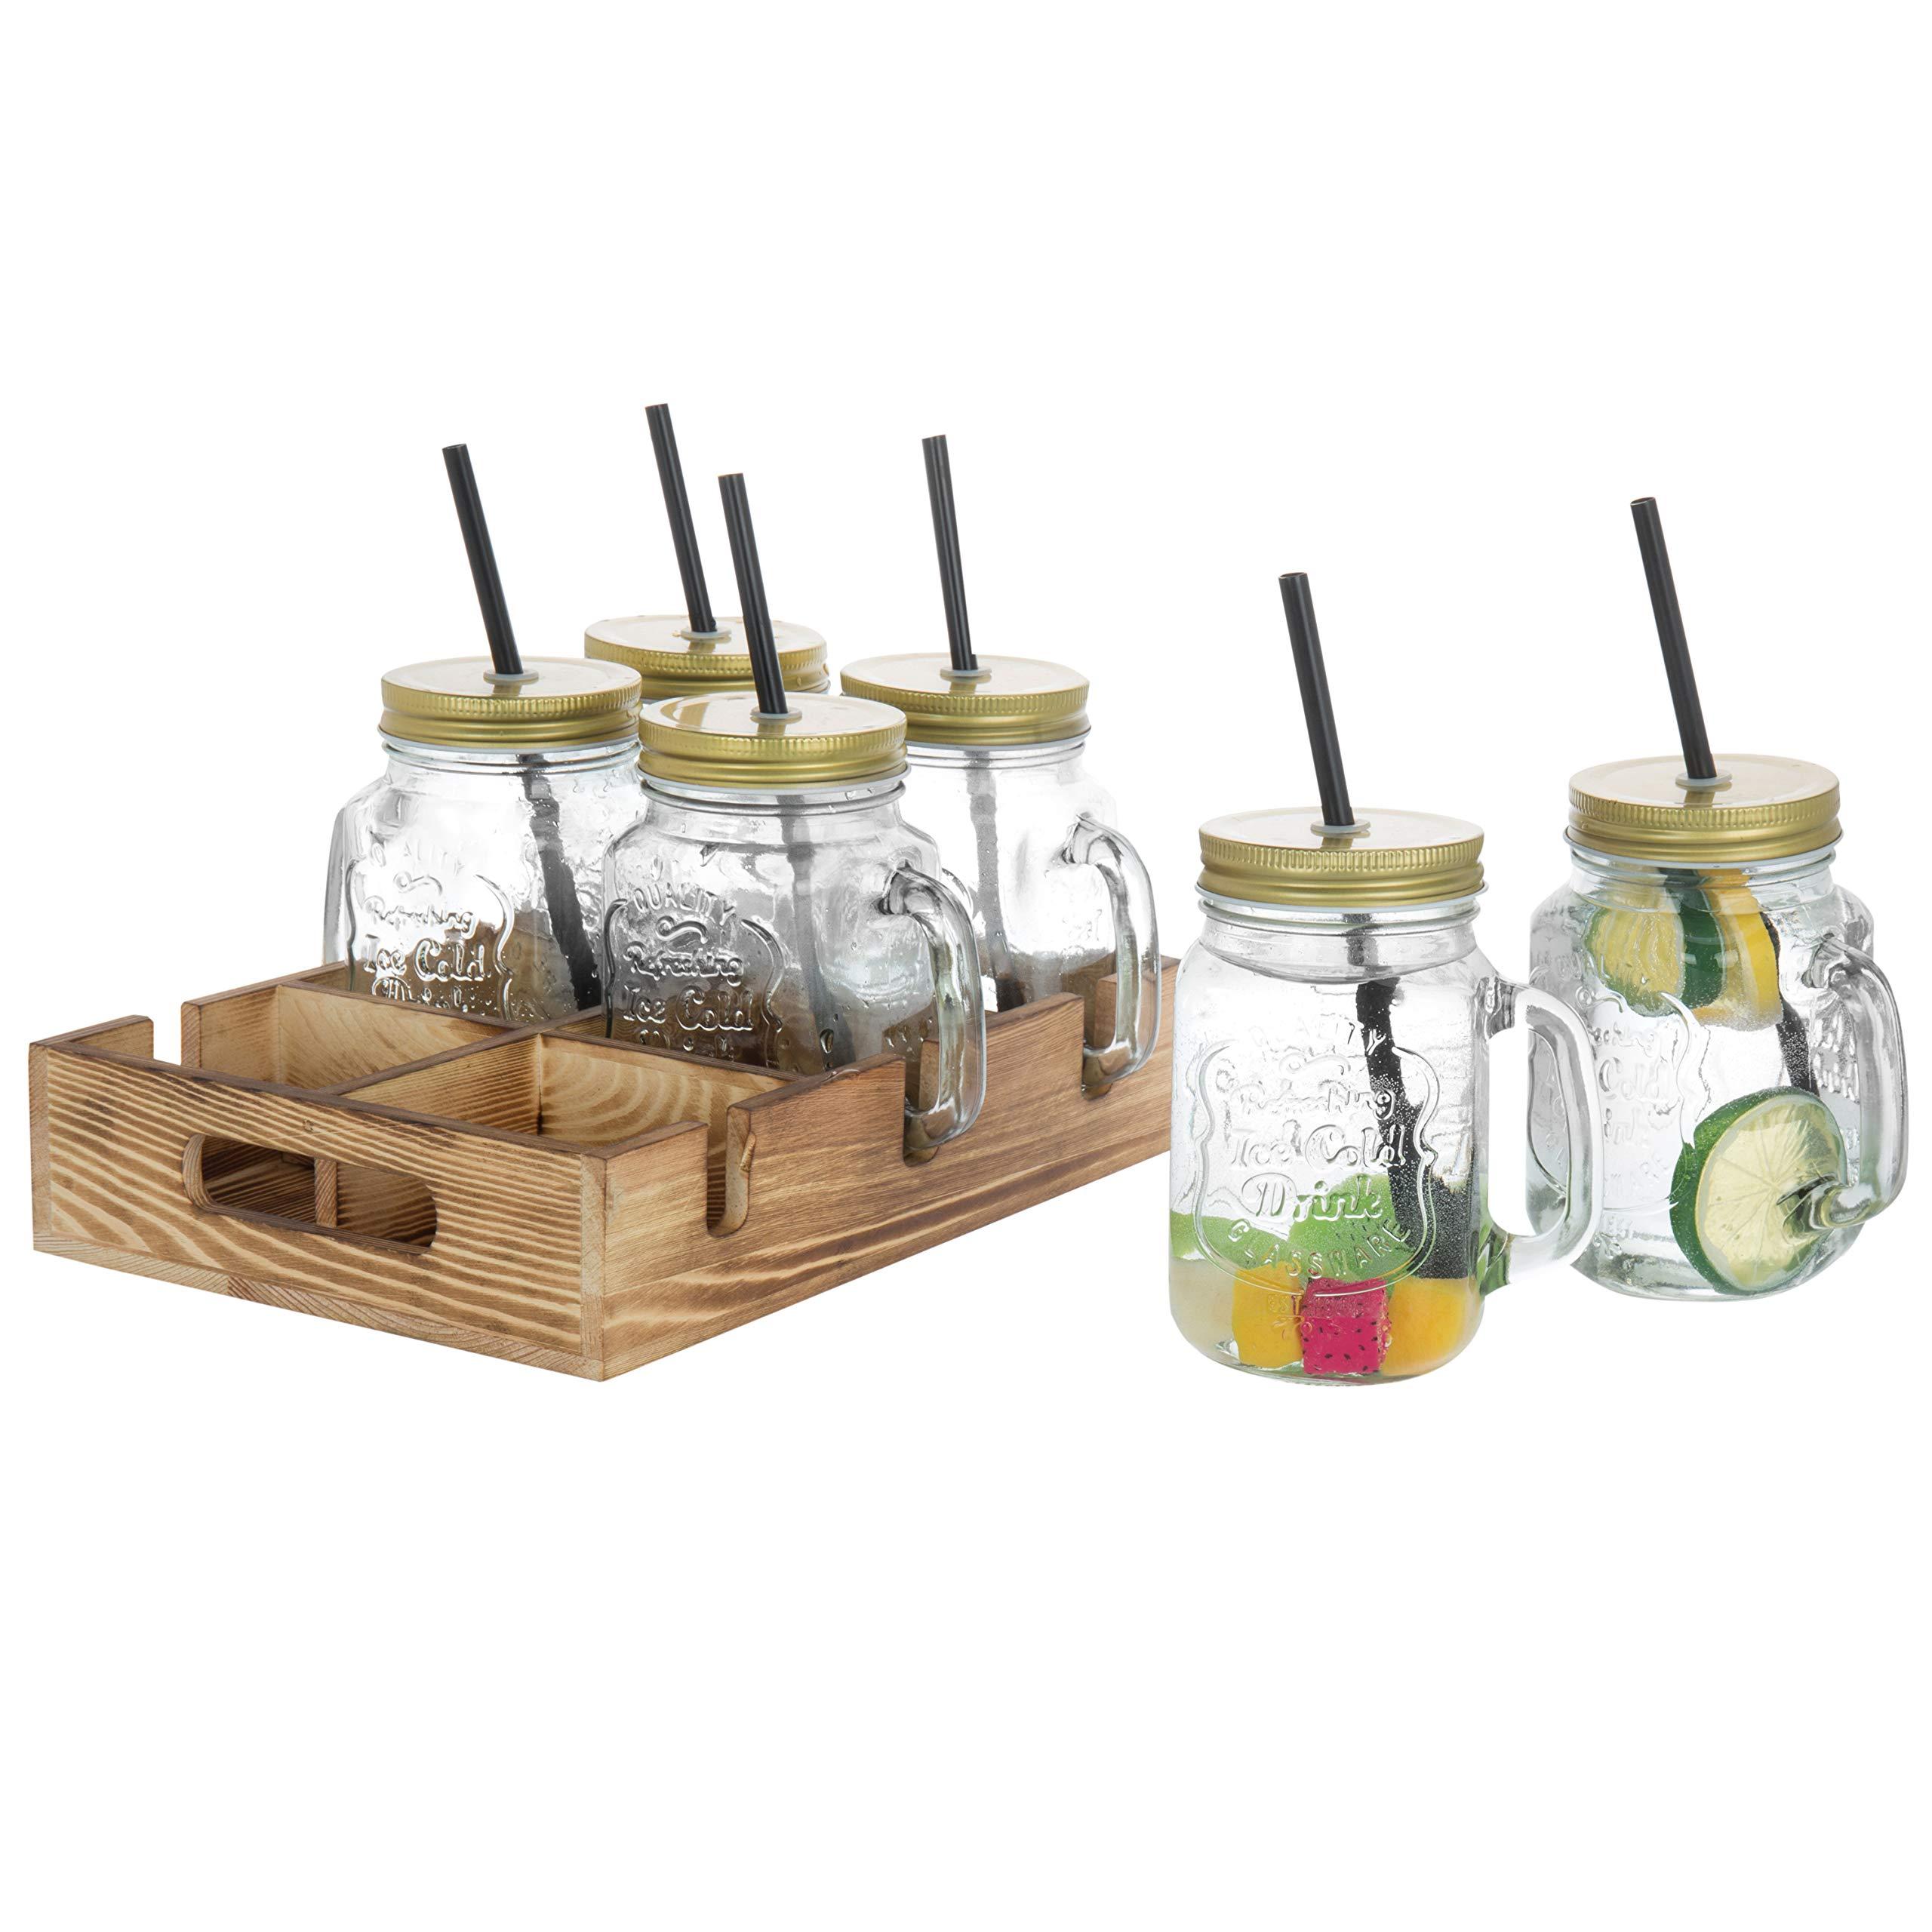 MyGift Mason Jar Mug Glasses with Lids, Straws & Wood Caddy, Brown, Set of 6